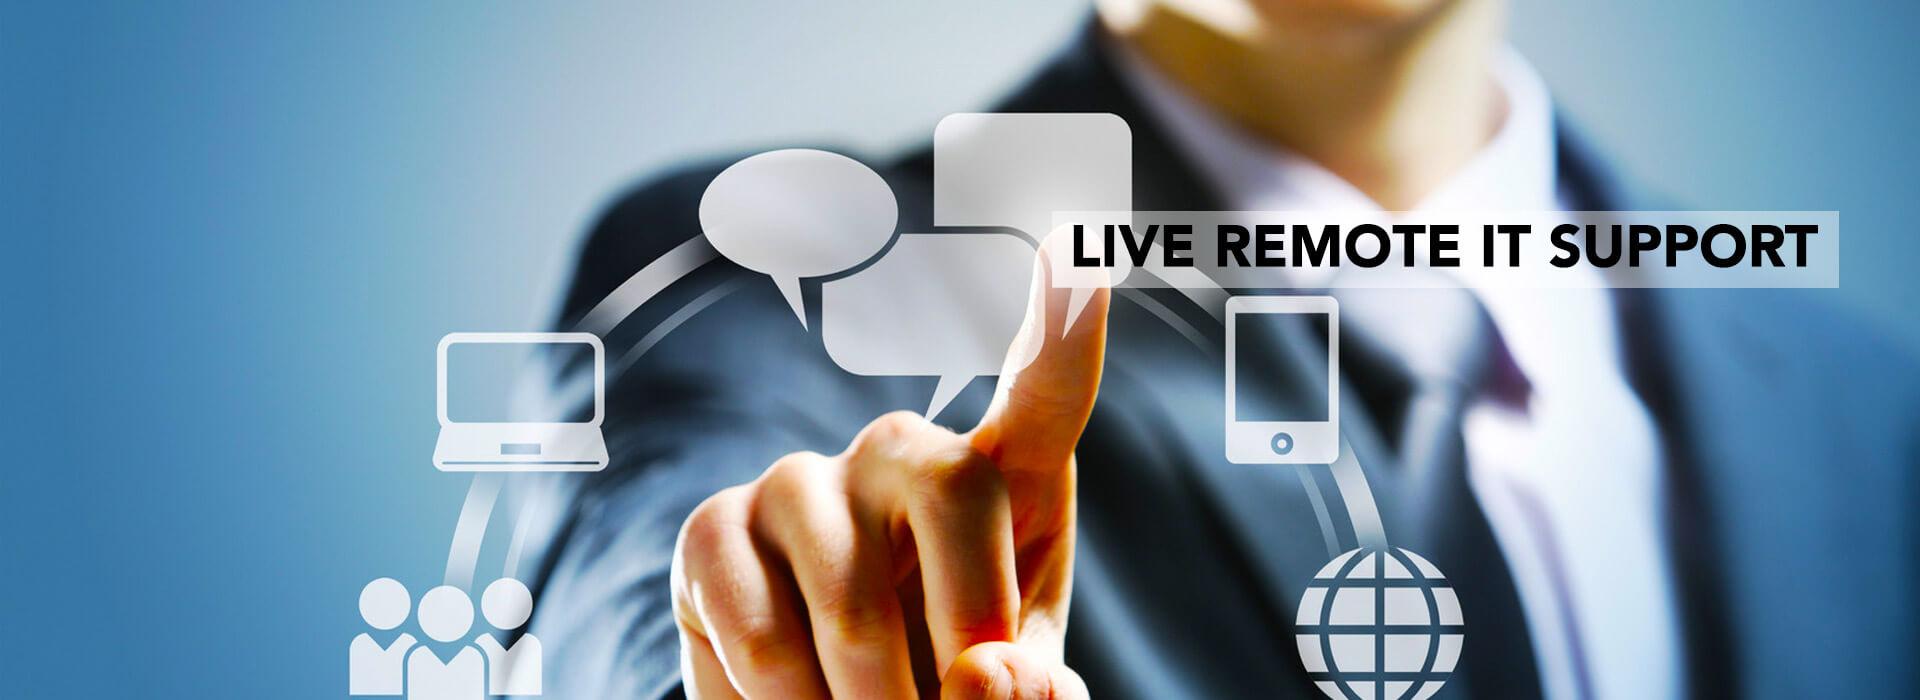 Help desk remote support service